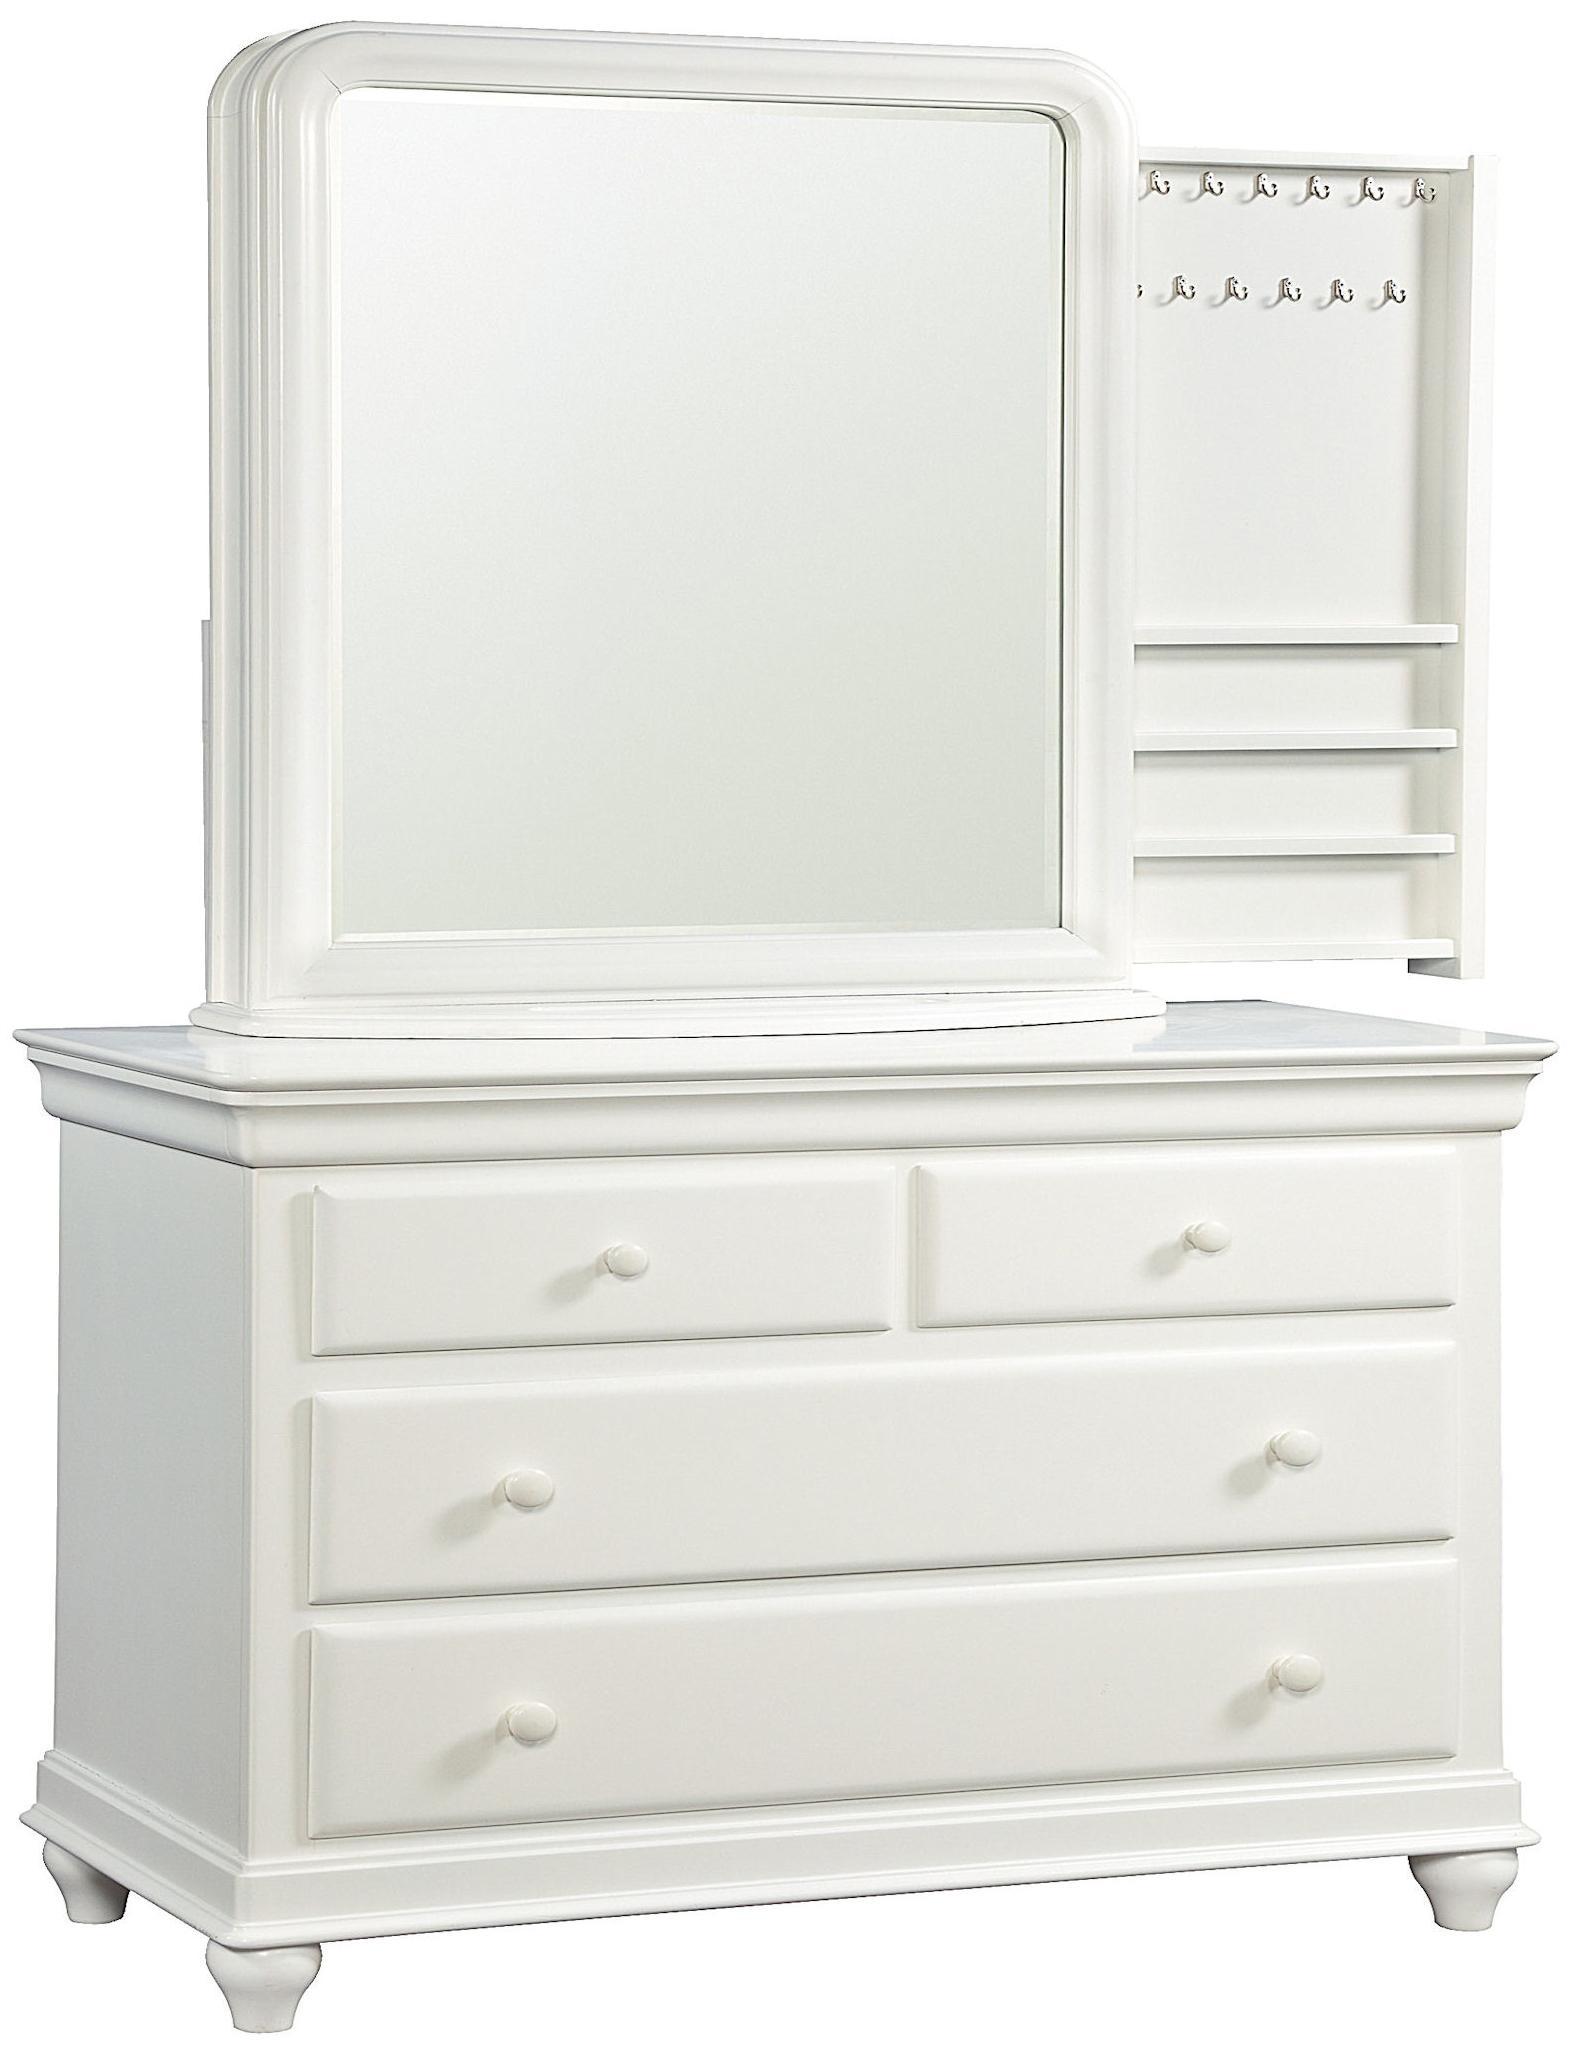 Smartstuff Classics 4.0 Single Dresser & Storage Mirror - Item Number: 131A001+030